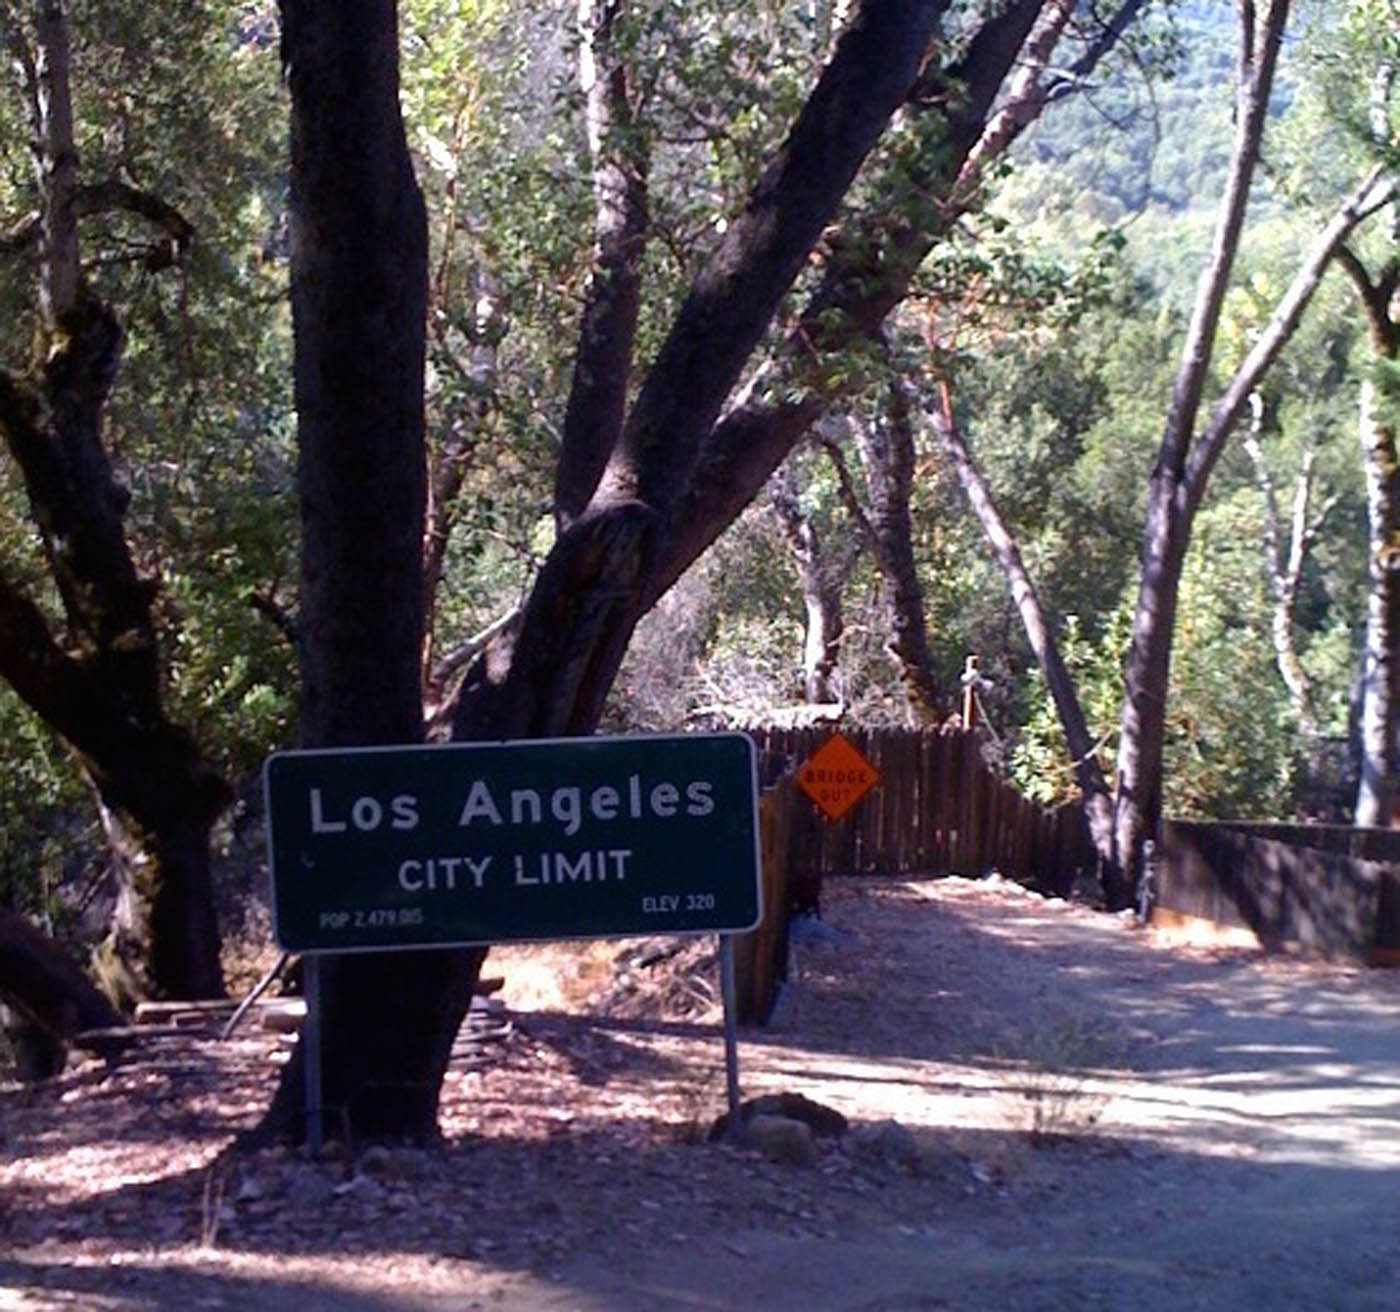 LA city limits photo_web.jpg